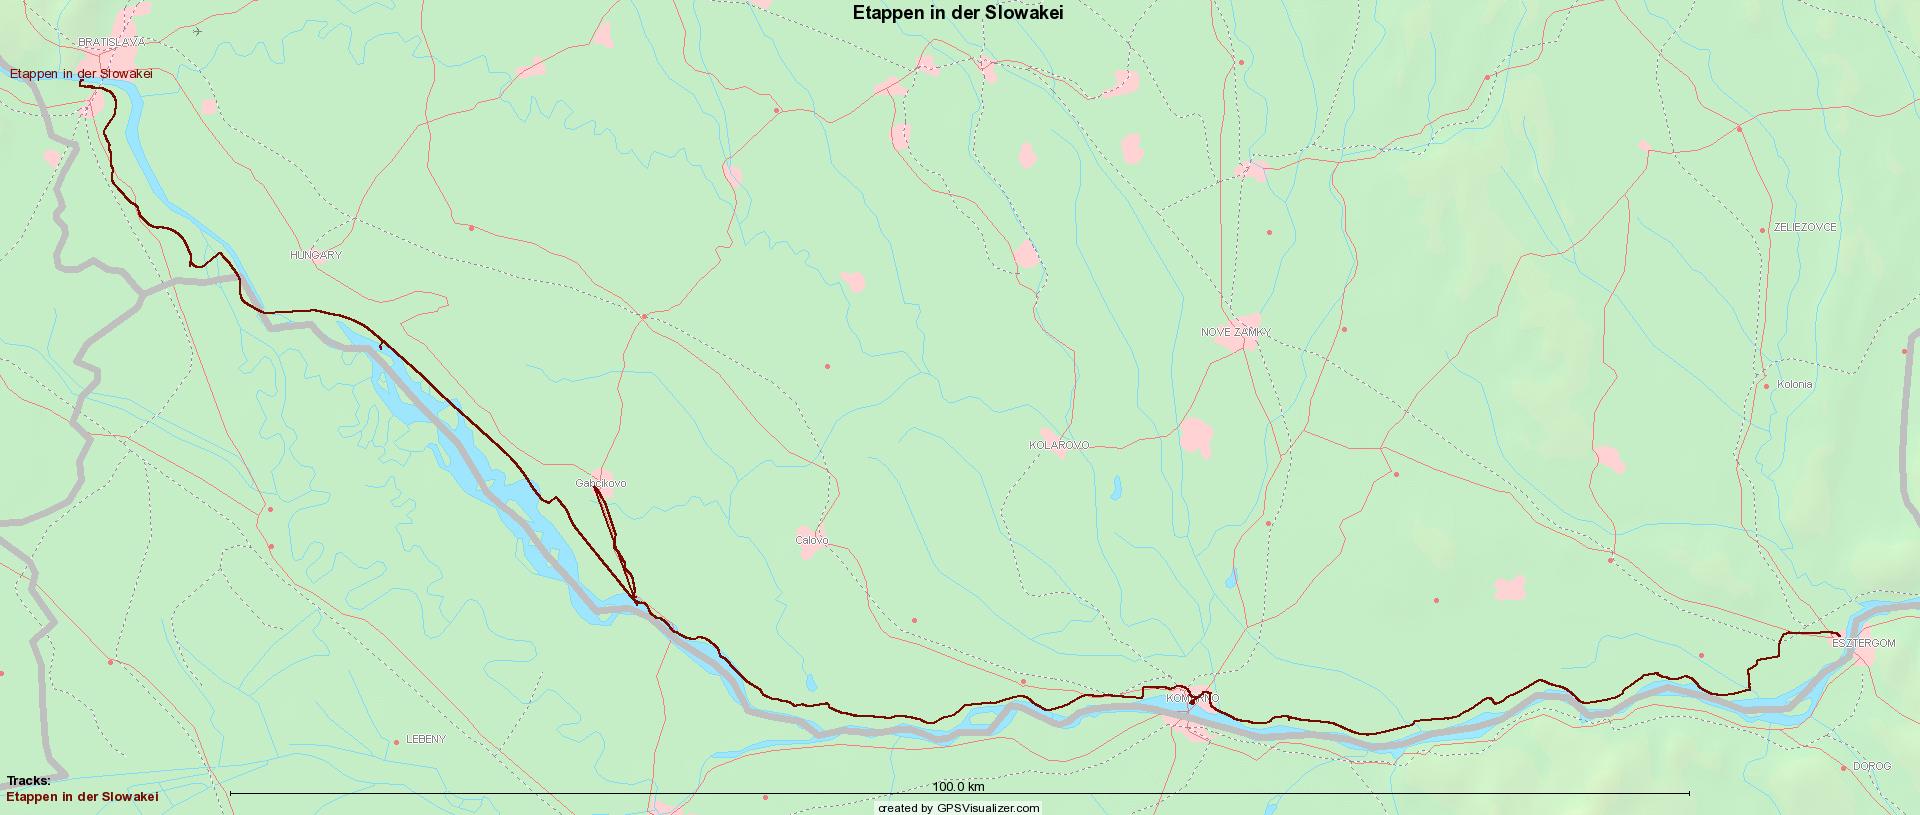 Etappen in der Slowakei